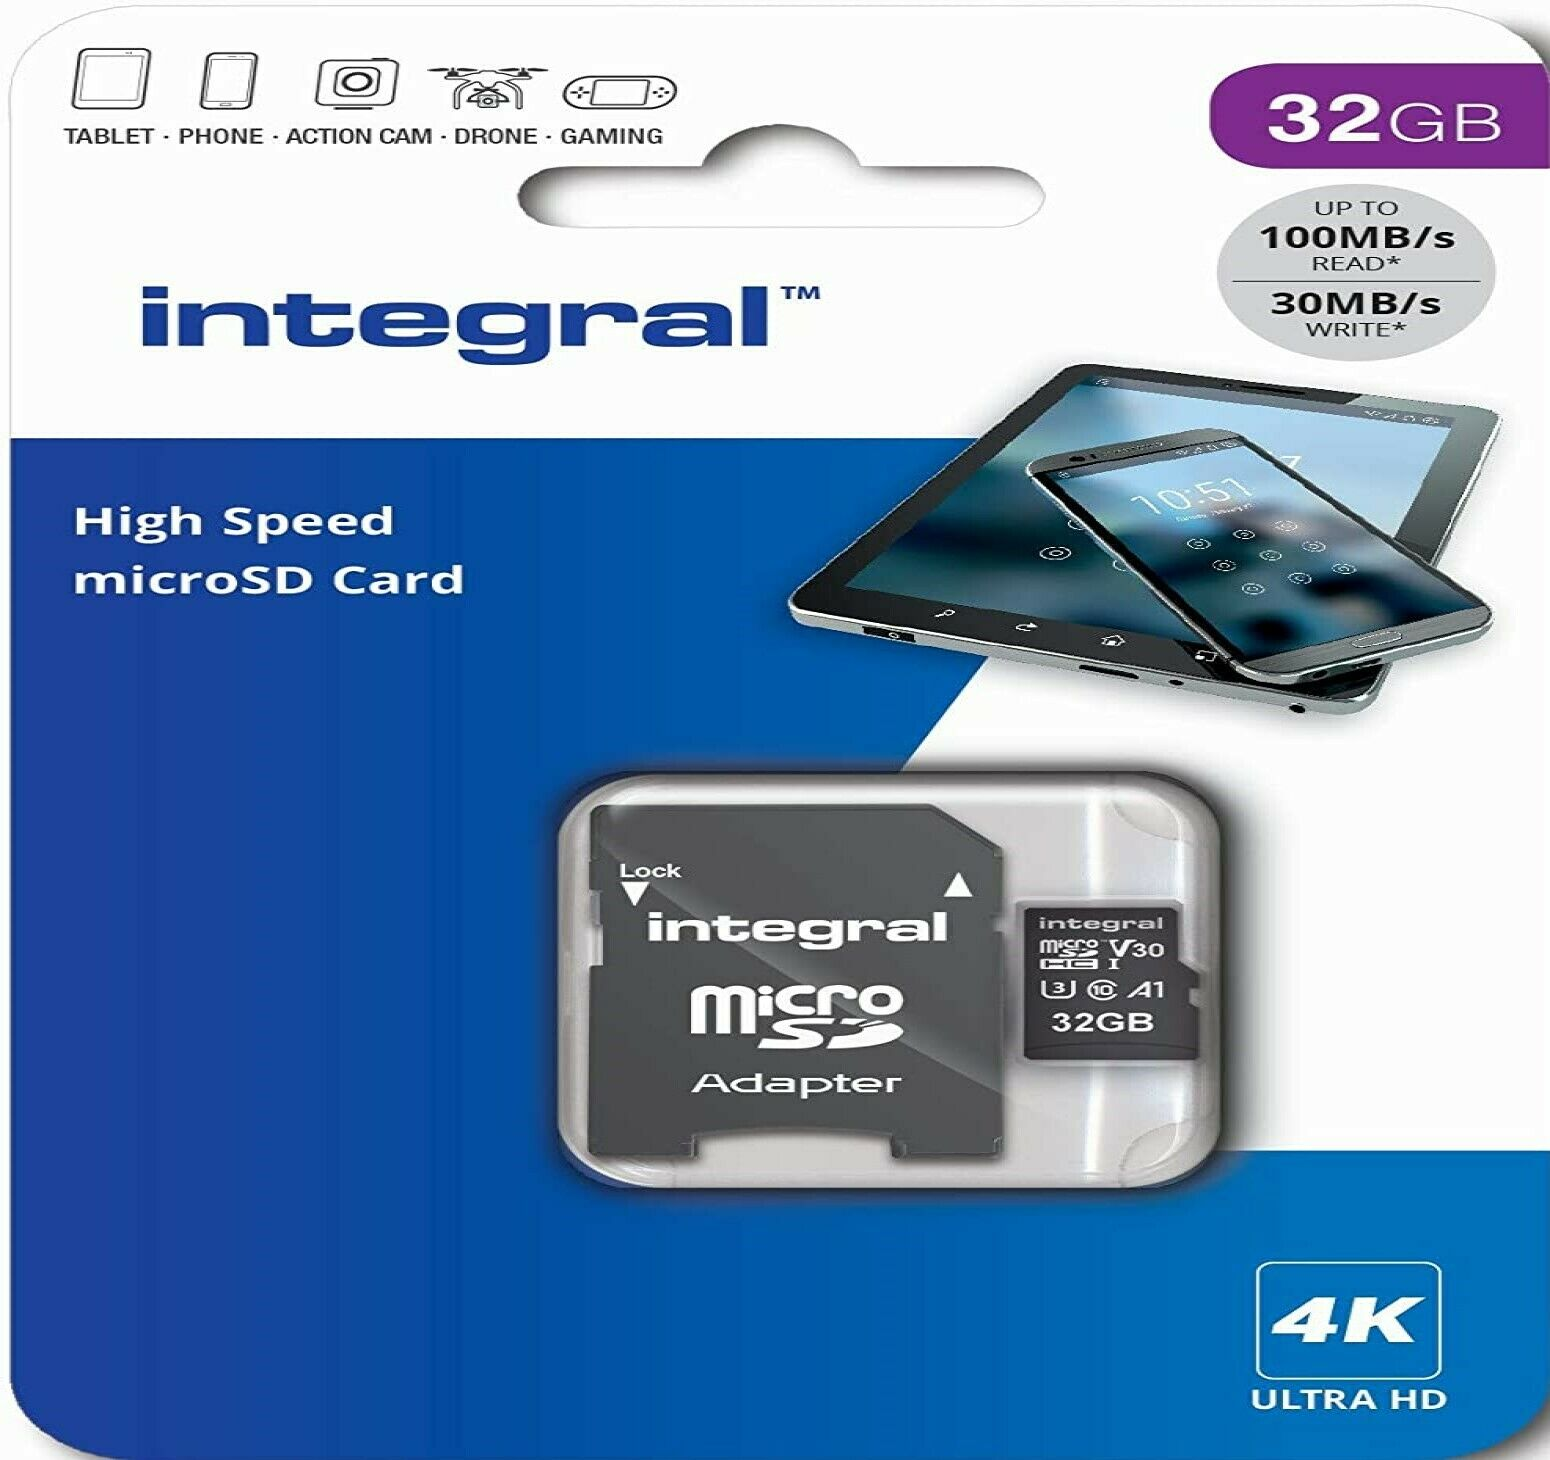 32GB 64GB 128GB Micro SD Card 4K Memory U3 V30 For Camcorder,Handycam,IP Camera